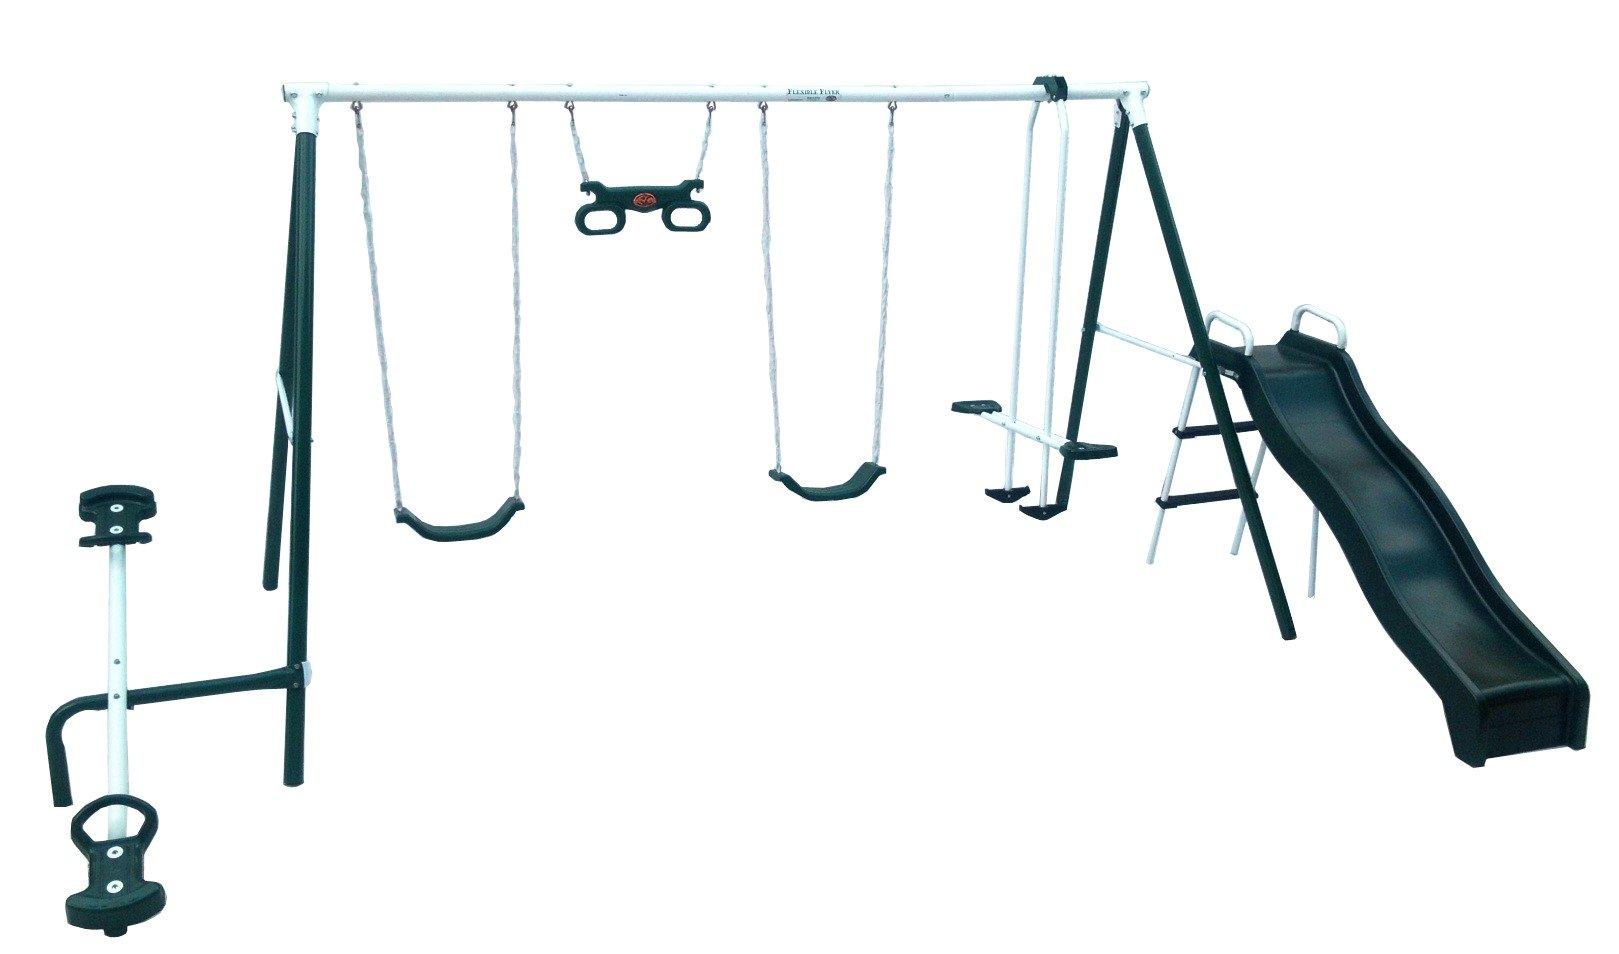 Awesome Flexible Flyer Backyard Swingin Fun Metal Swing Set